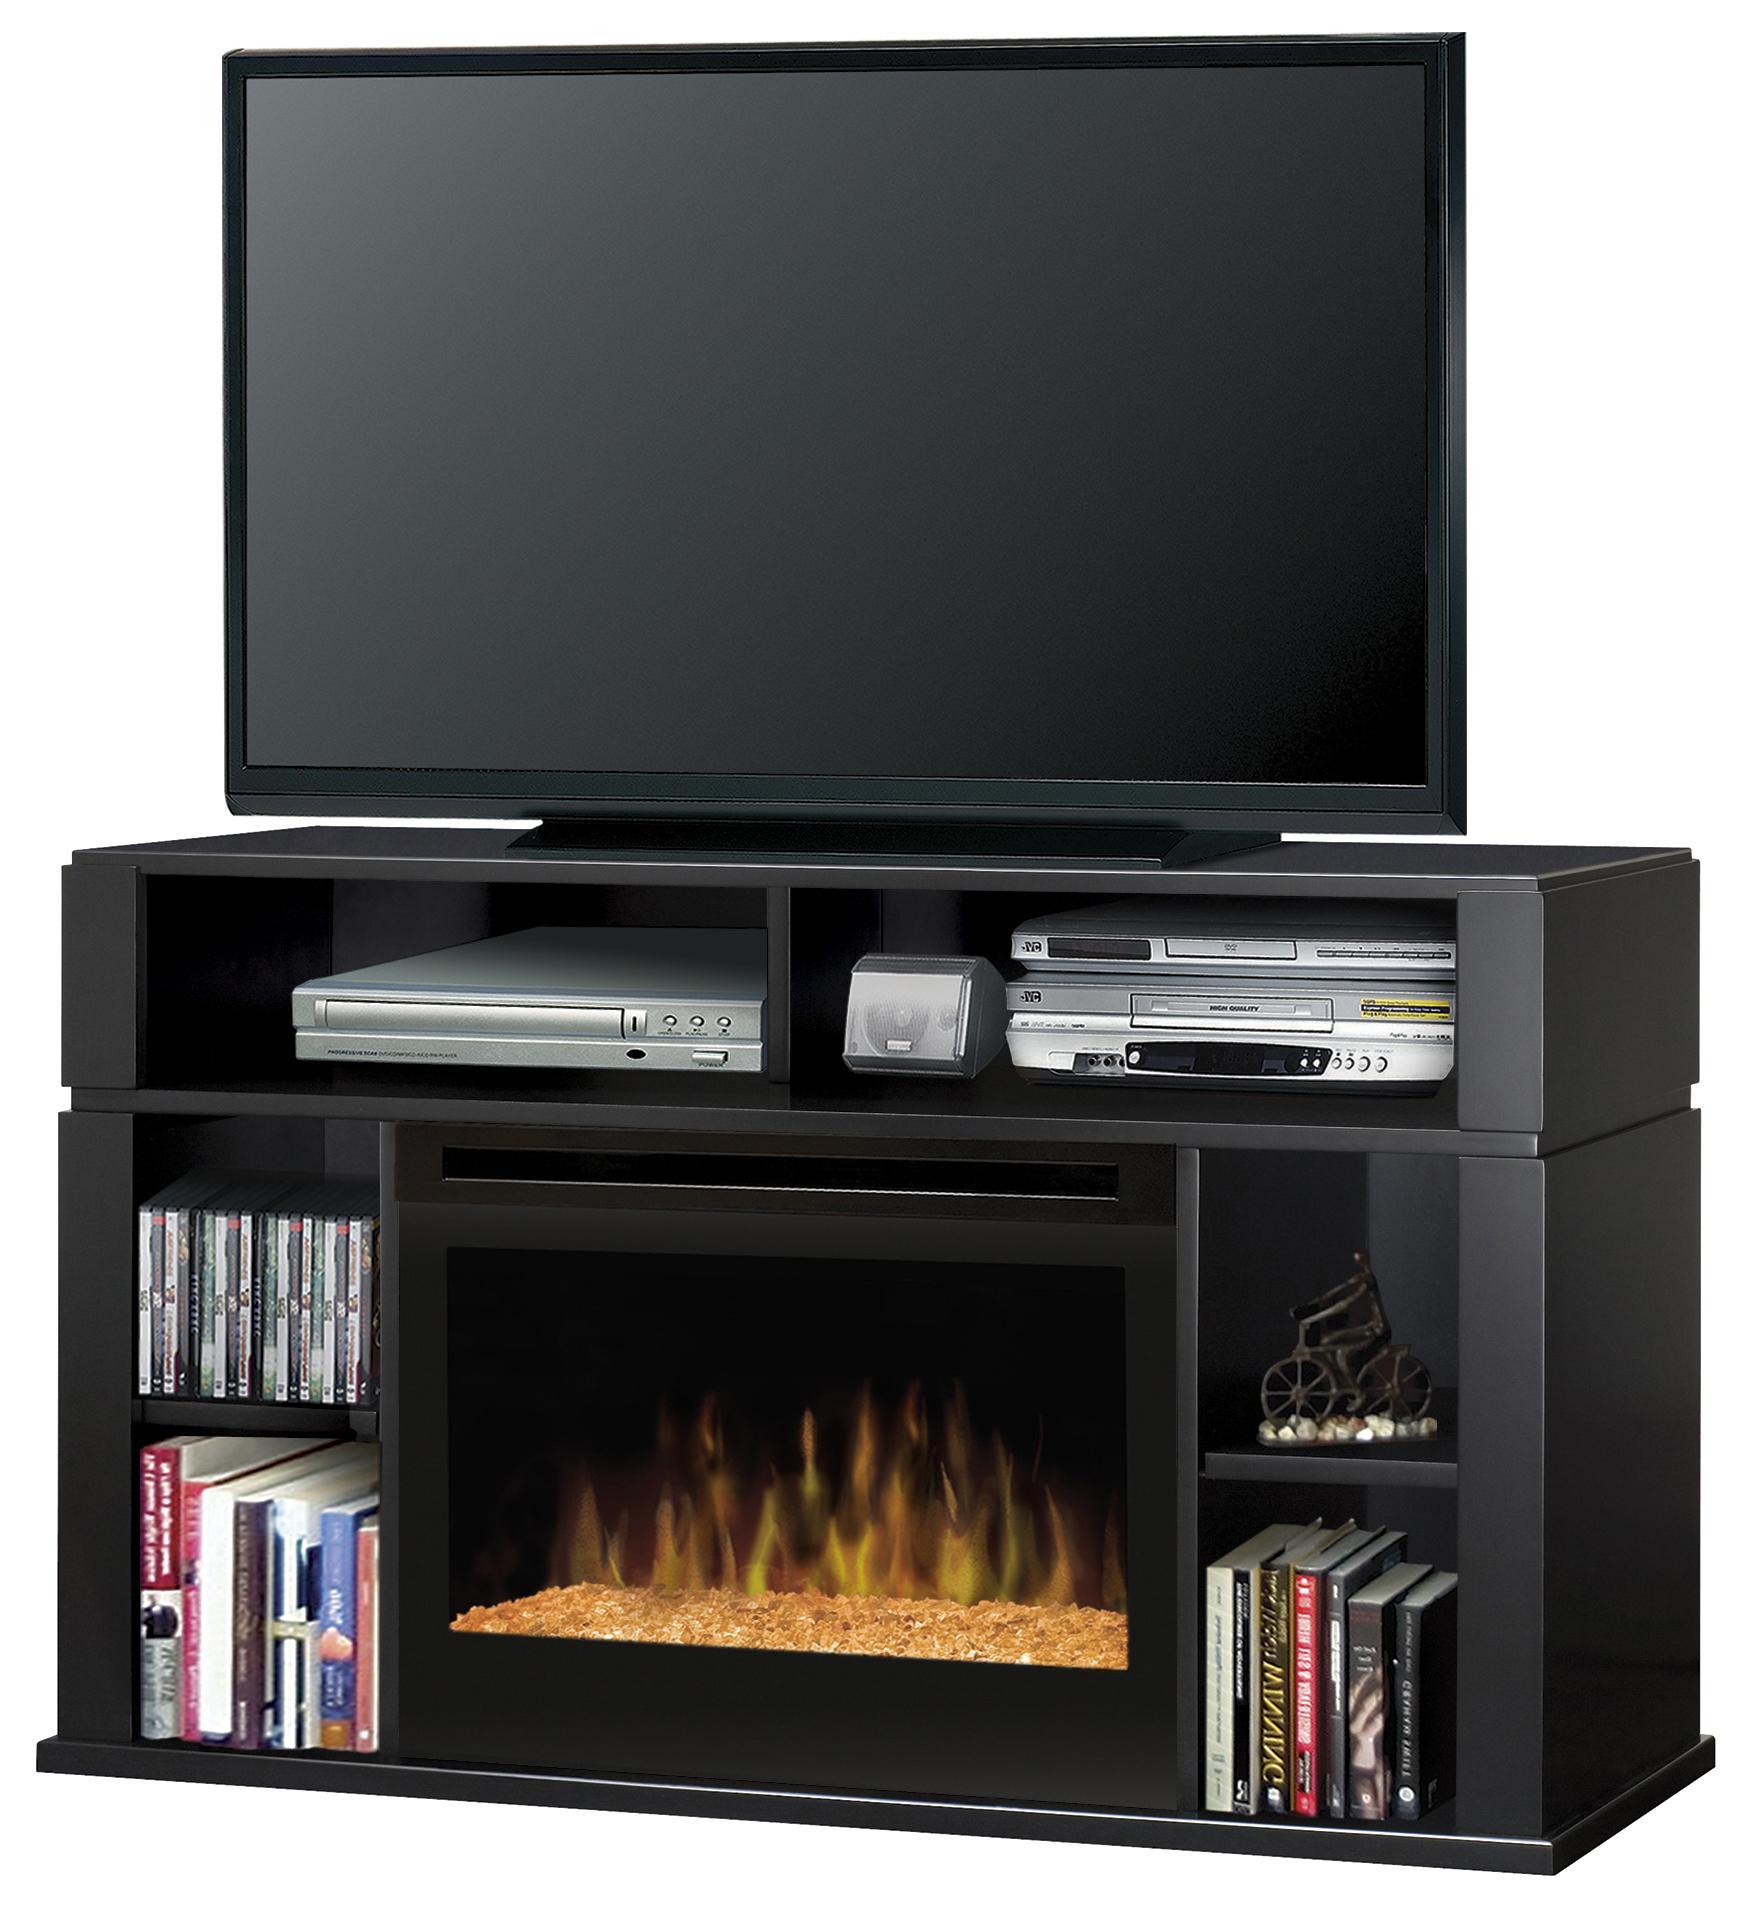 Dimplex Media Console Fireplaces SAP 200 B Contemporary